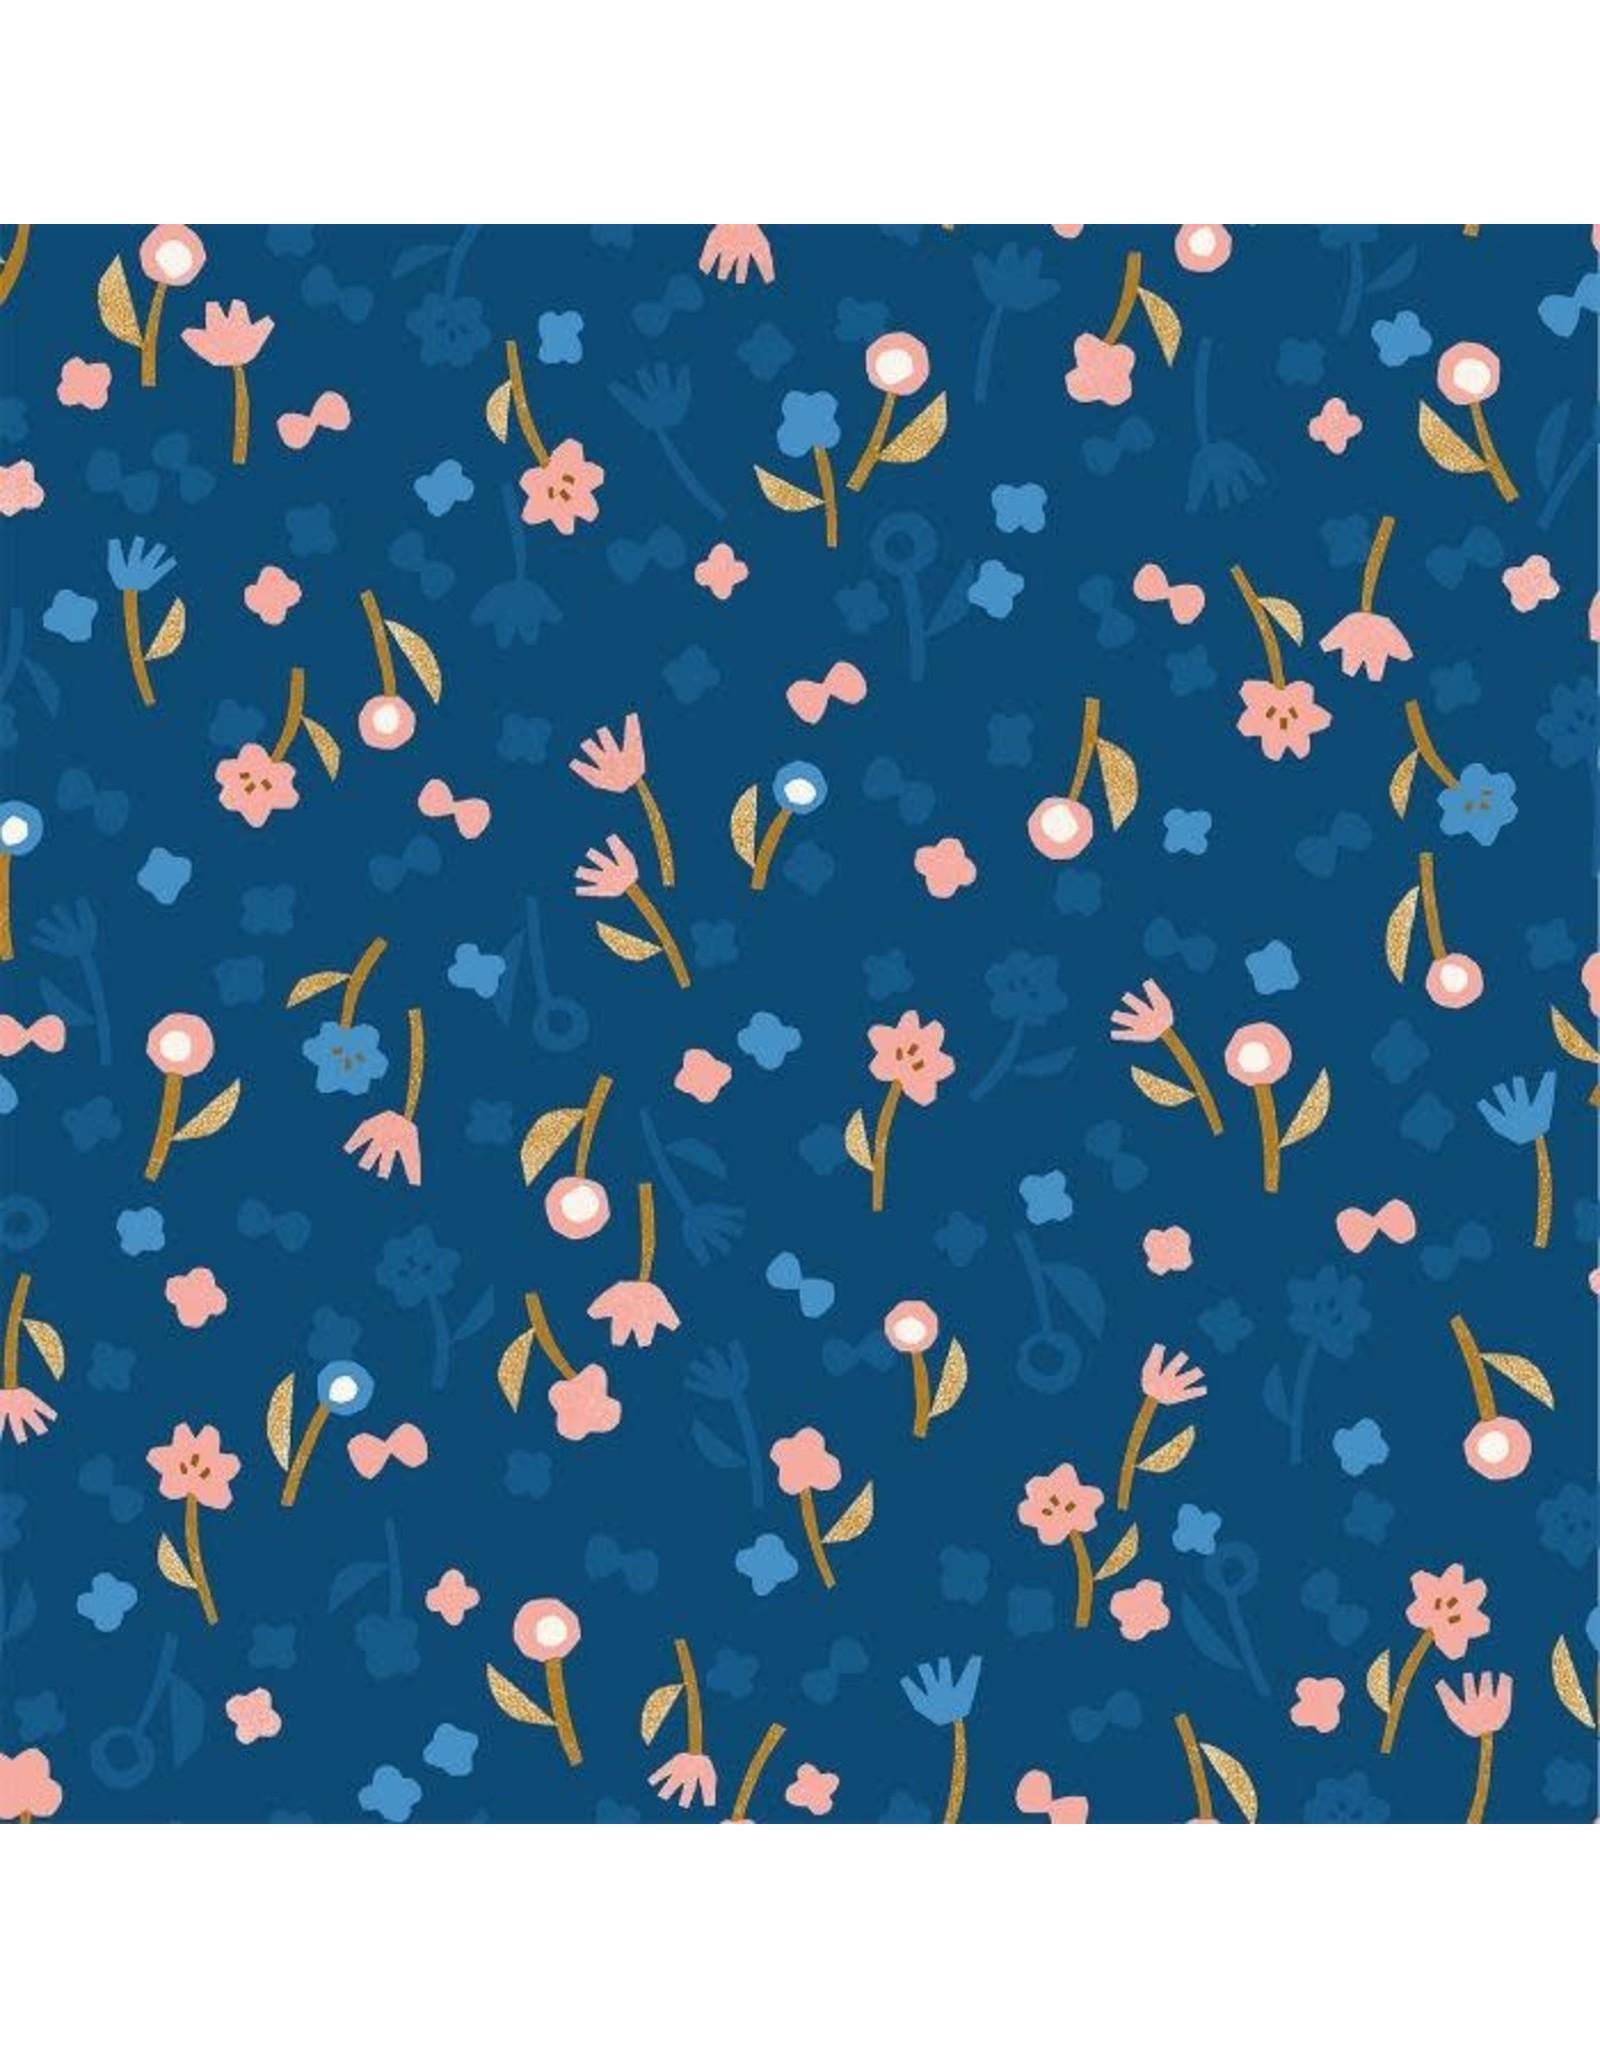 Cotton + Steel Rayon, Neko and Tori, Flower Picking in Blue, Fabric Half-Yards IN103-BL4R